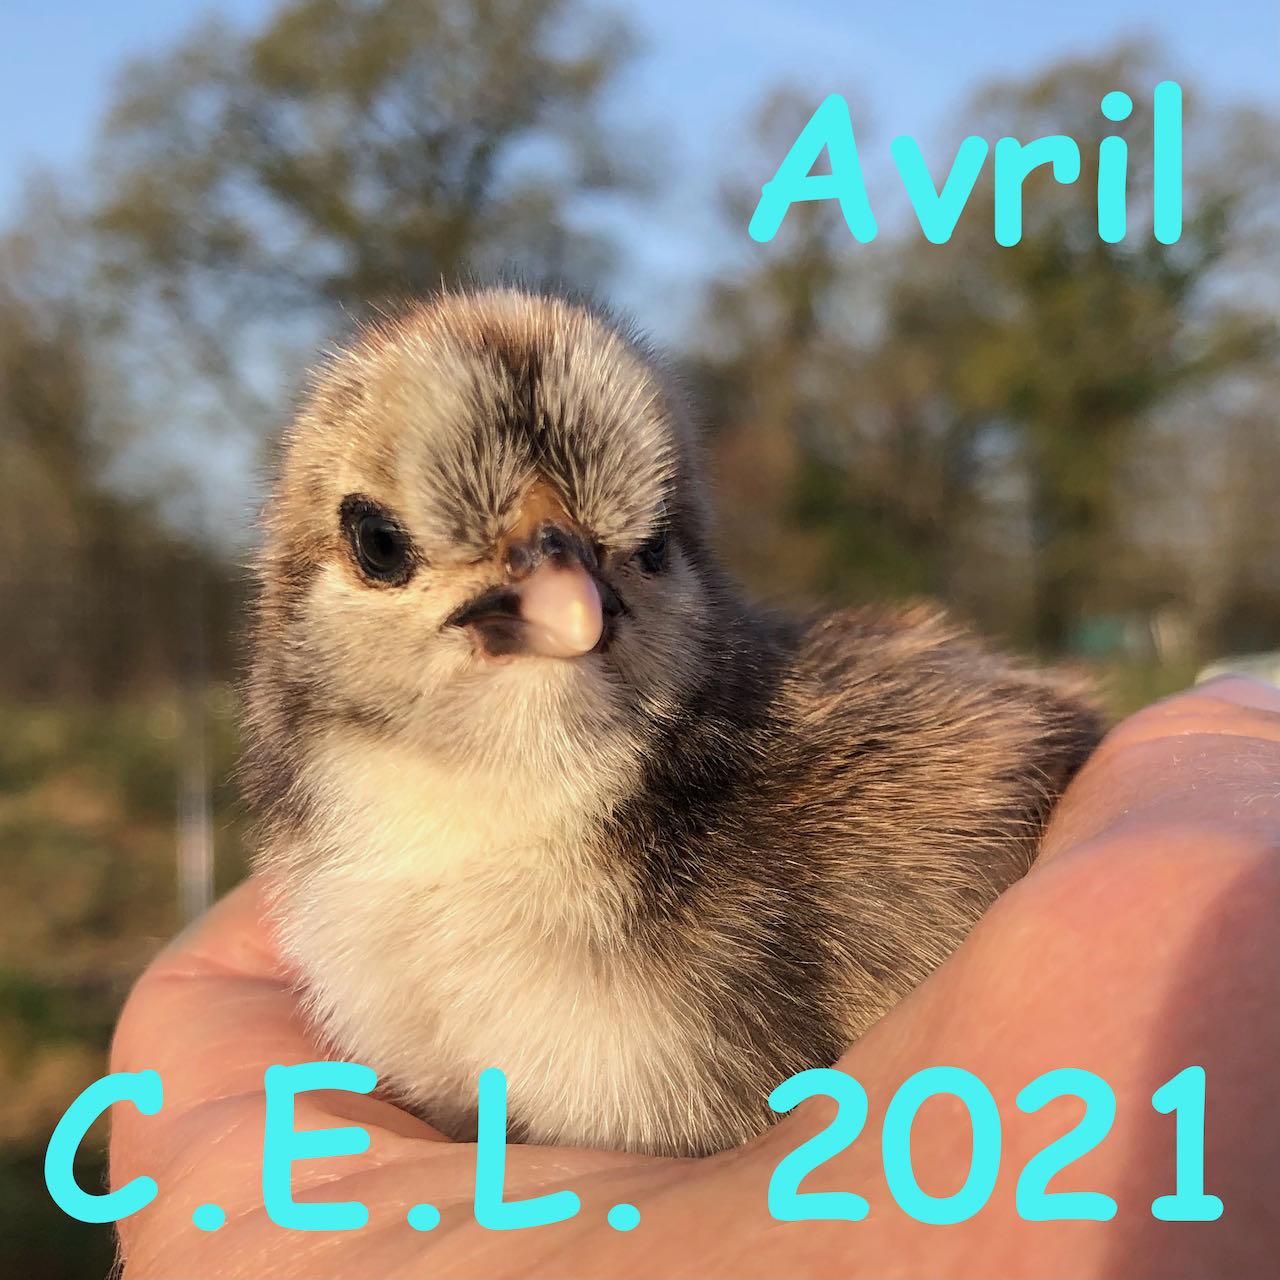 Avril 2021 🤩